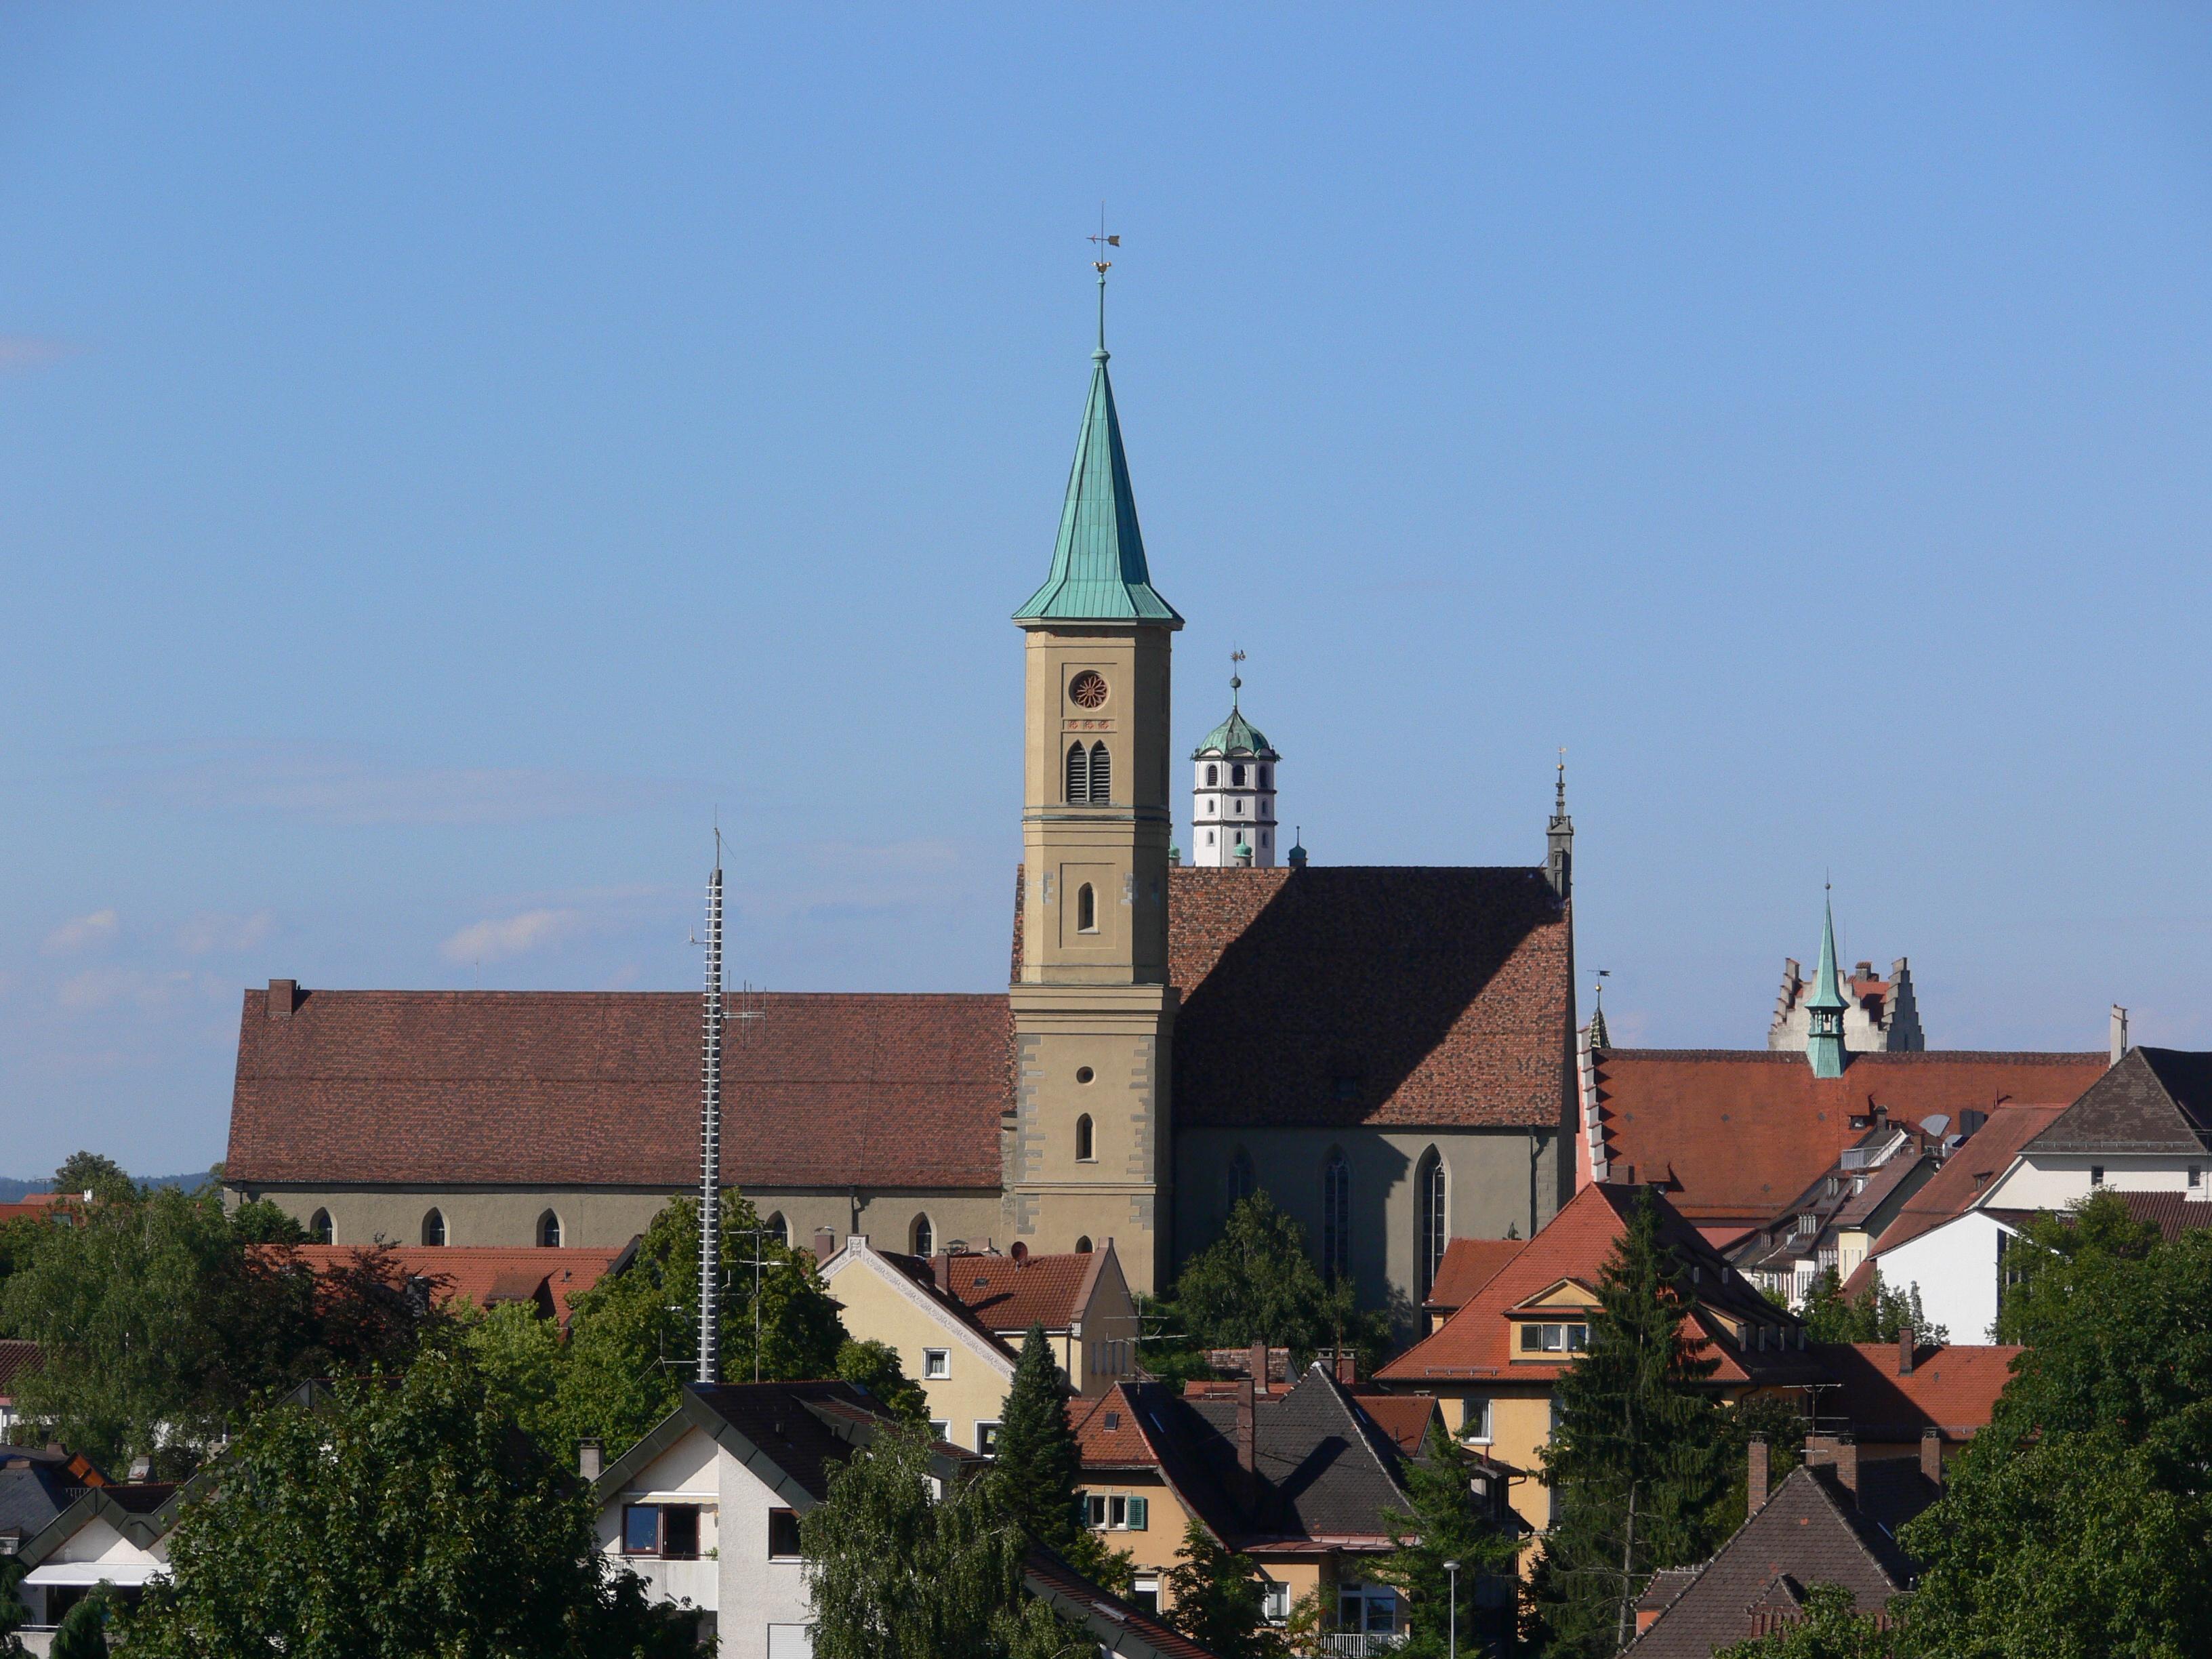 https://upload.wikimedia.org/wikipedia/commons/f/f3/Ravensburg_Ev_Stadtkirche.jpg